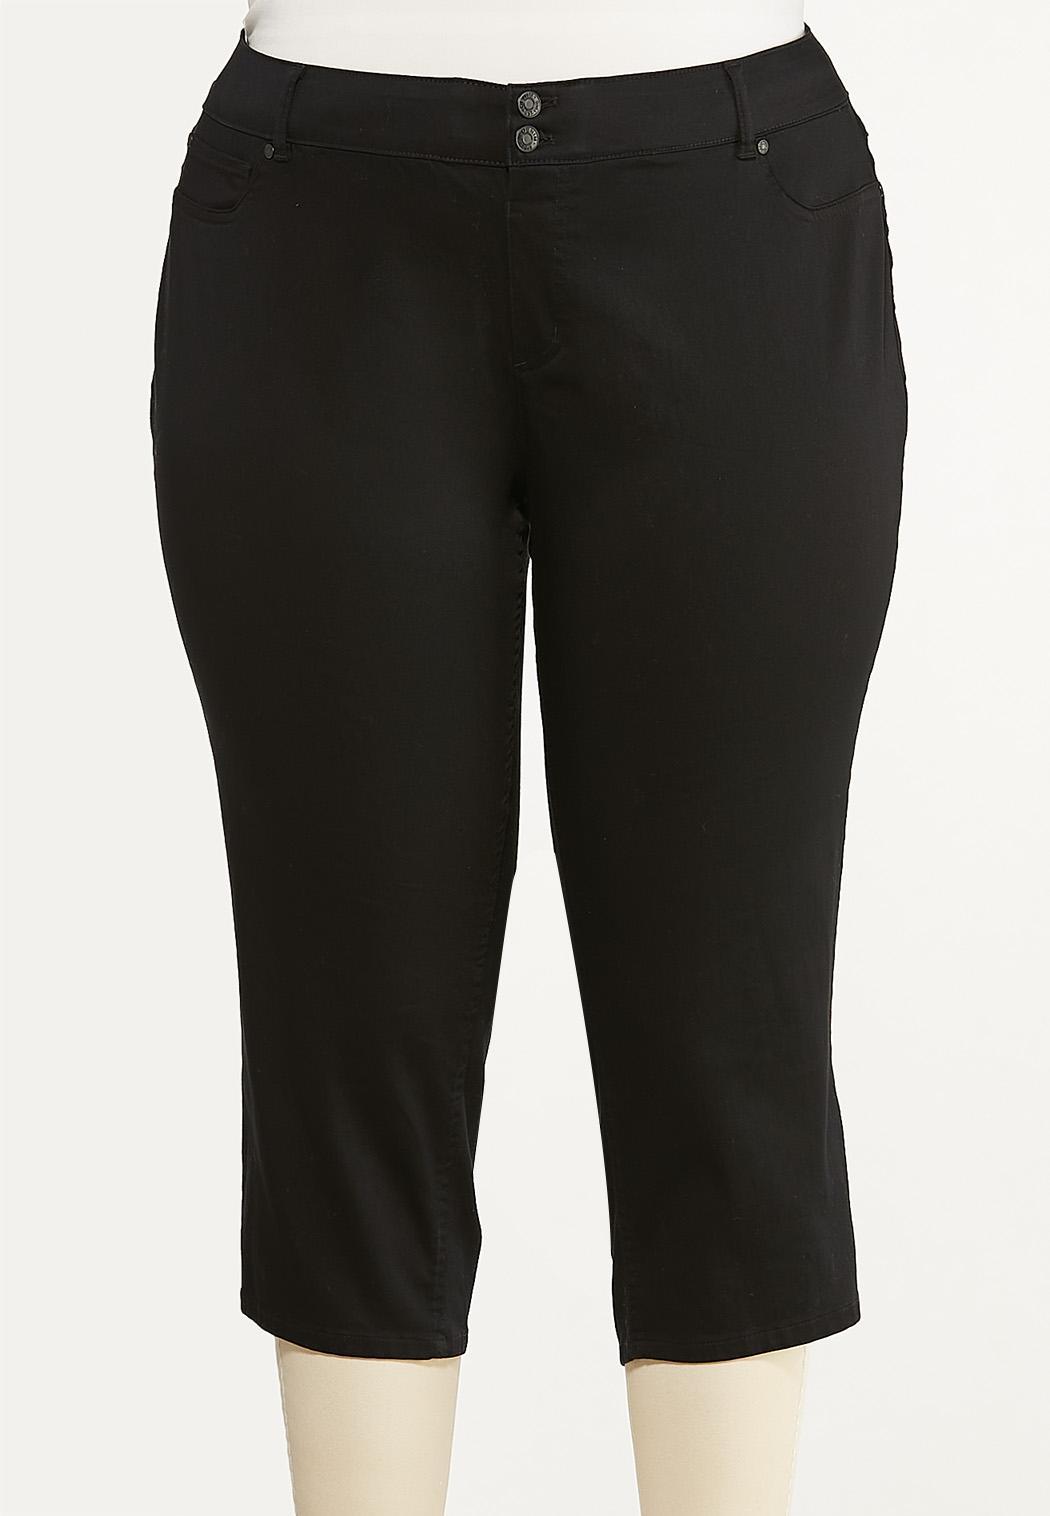 Plus Size Cropped Black Jeans